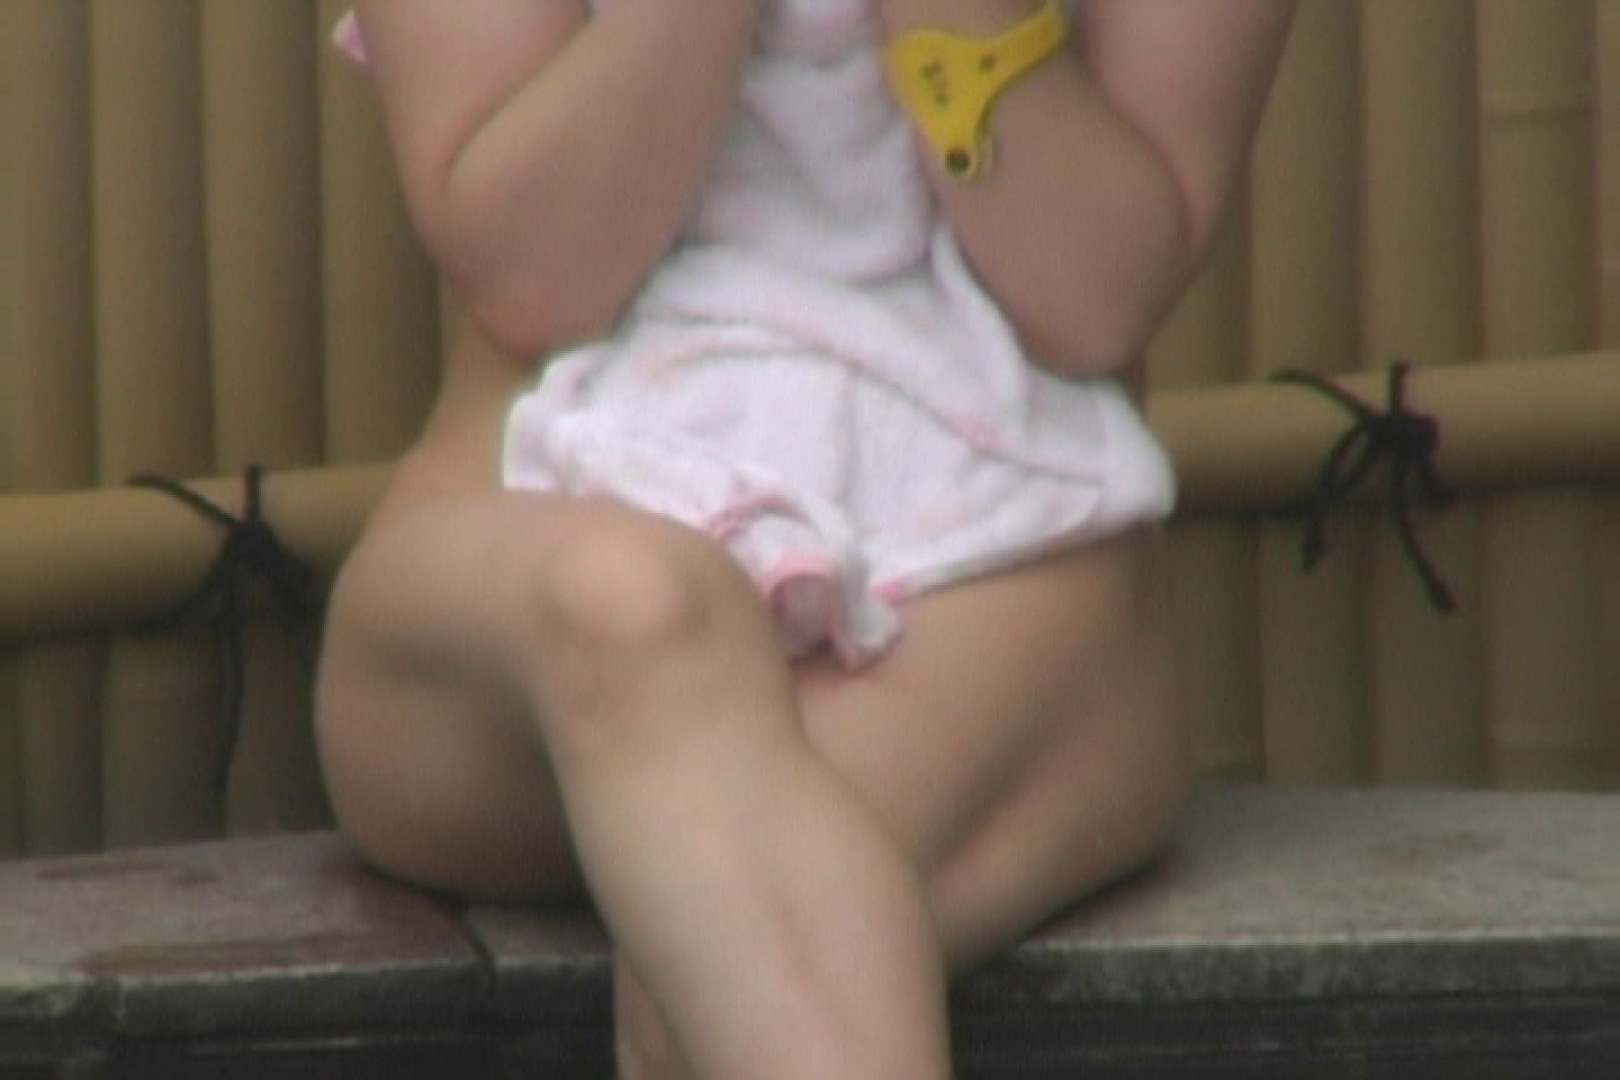 Aquaな露天風呂Vol.11【VIP】 露天 隠し撮りオマンコ動画紹介 67画像 59